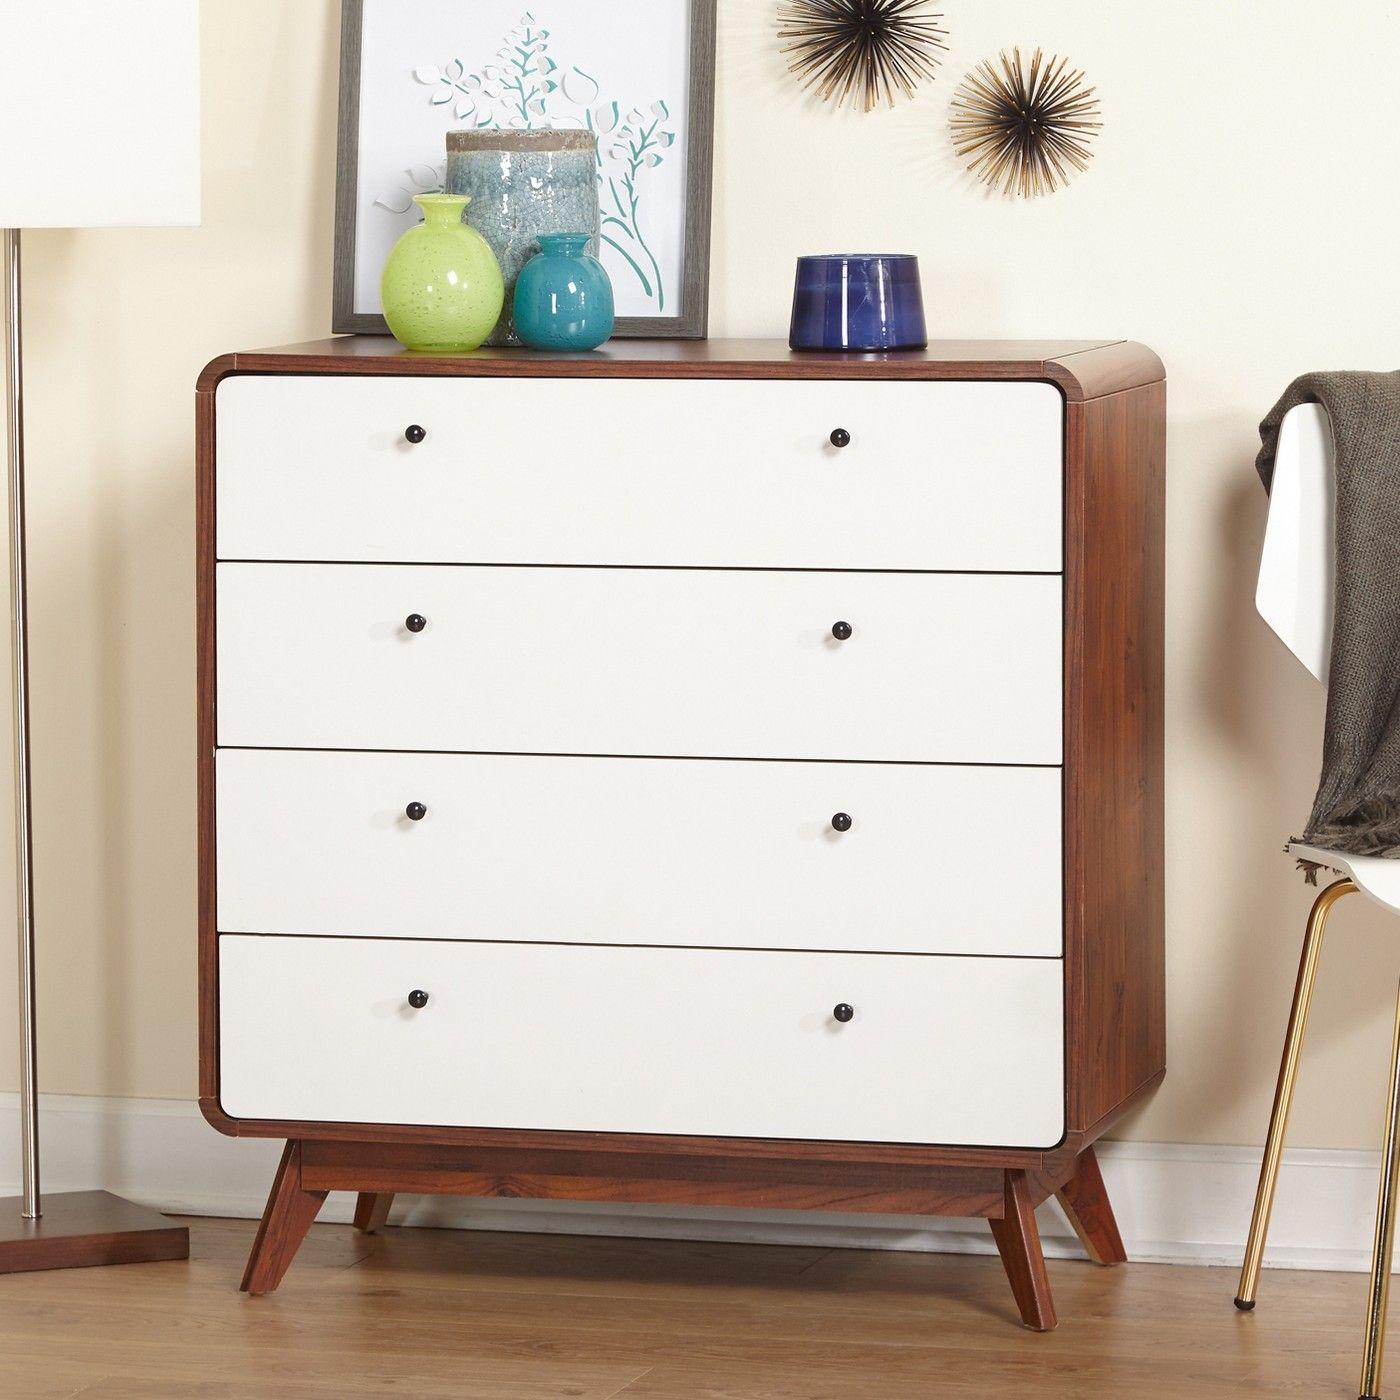 Target 4 Drawer Dresser Overview Manufacturer Media Reviews Ideas